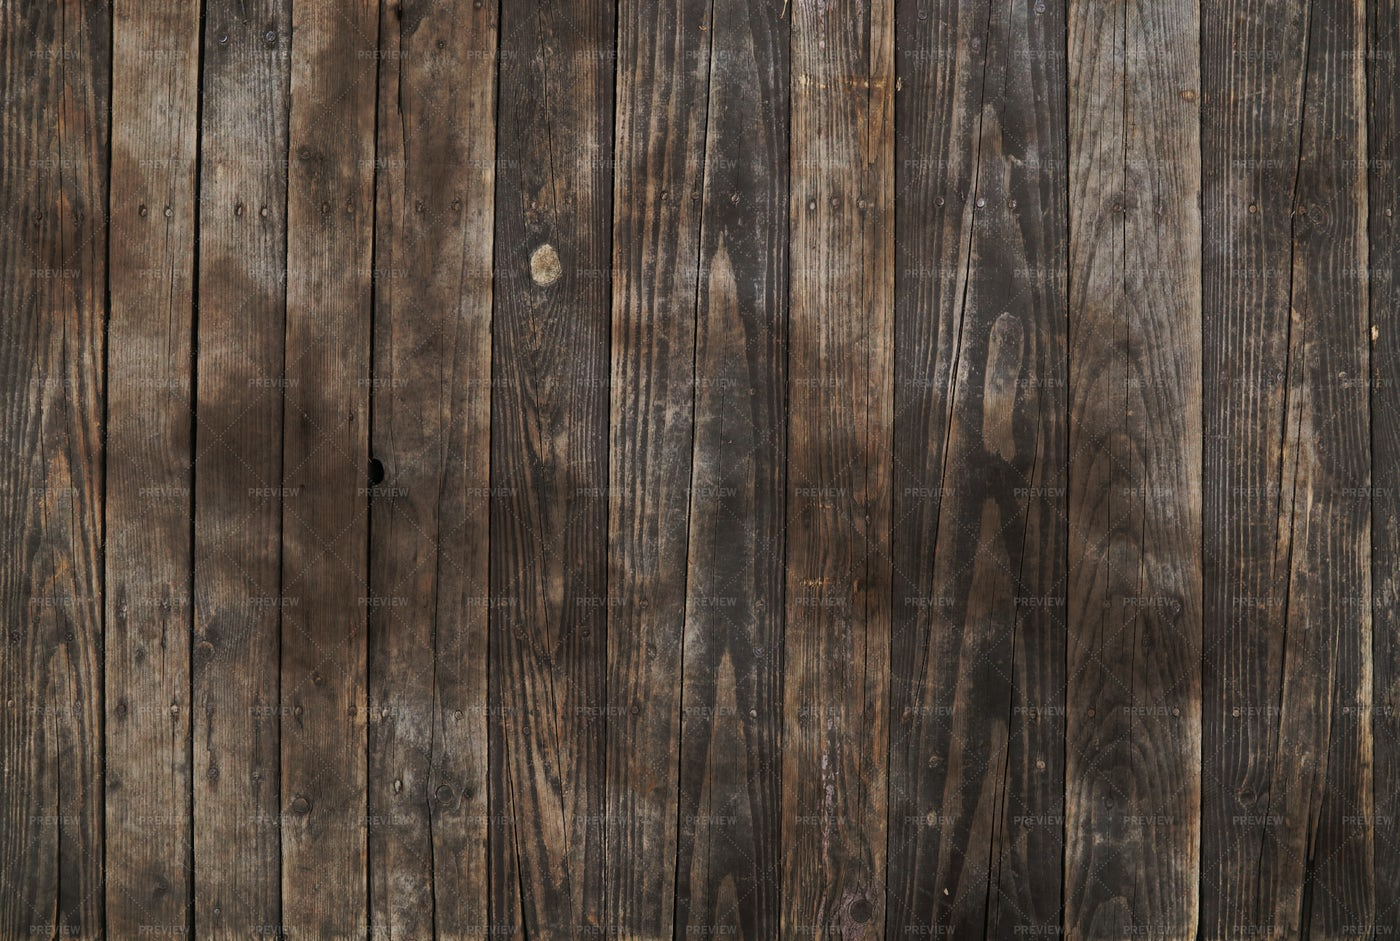 Dark Wooden Planks: Stock Photos